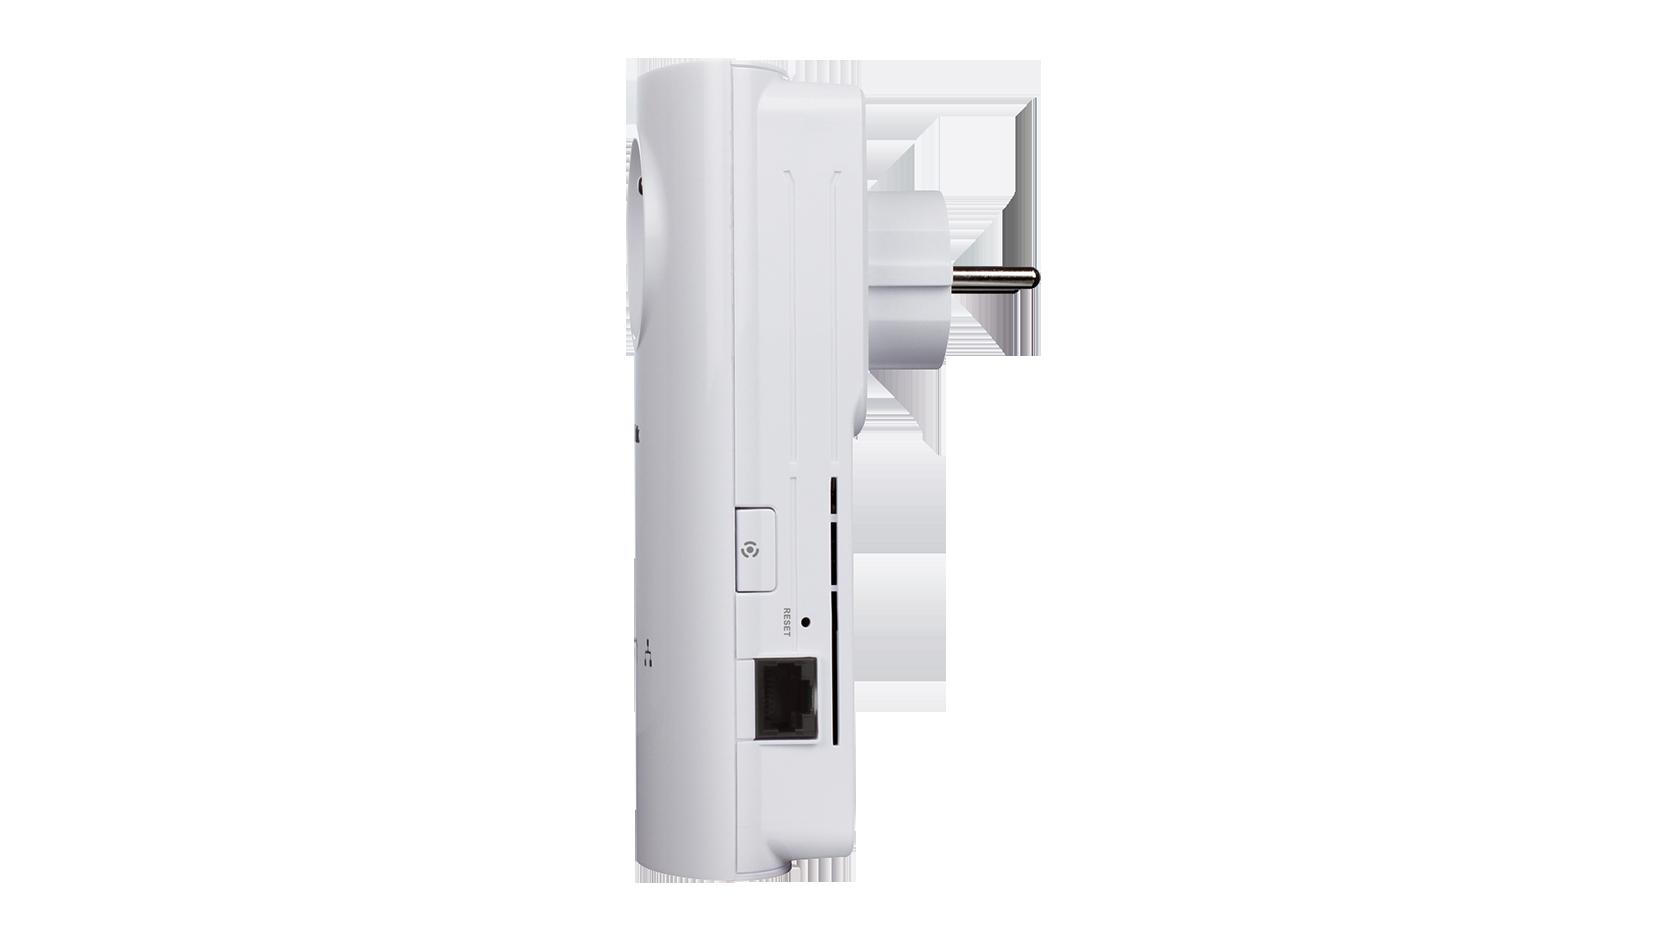 D-Link DHP-P500AV Passthrough Adapter Download Drivers